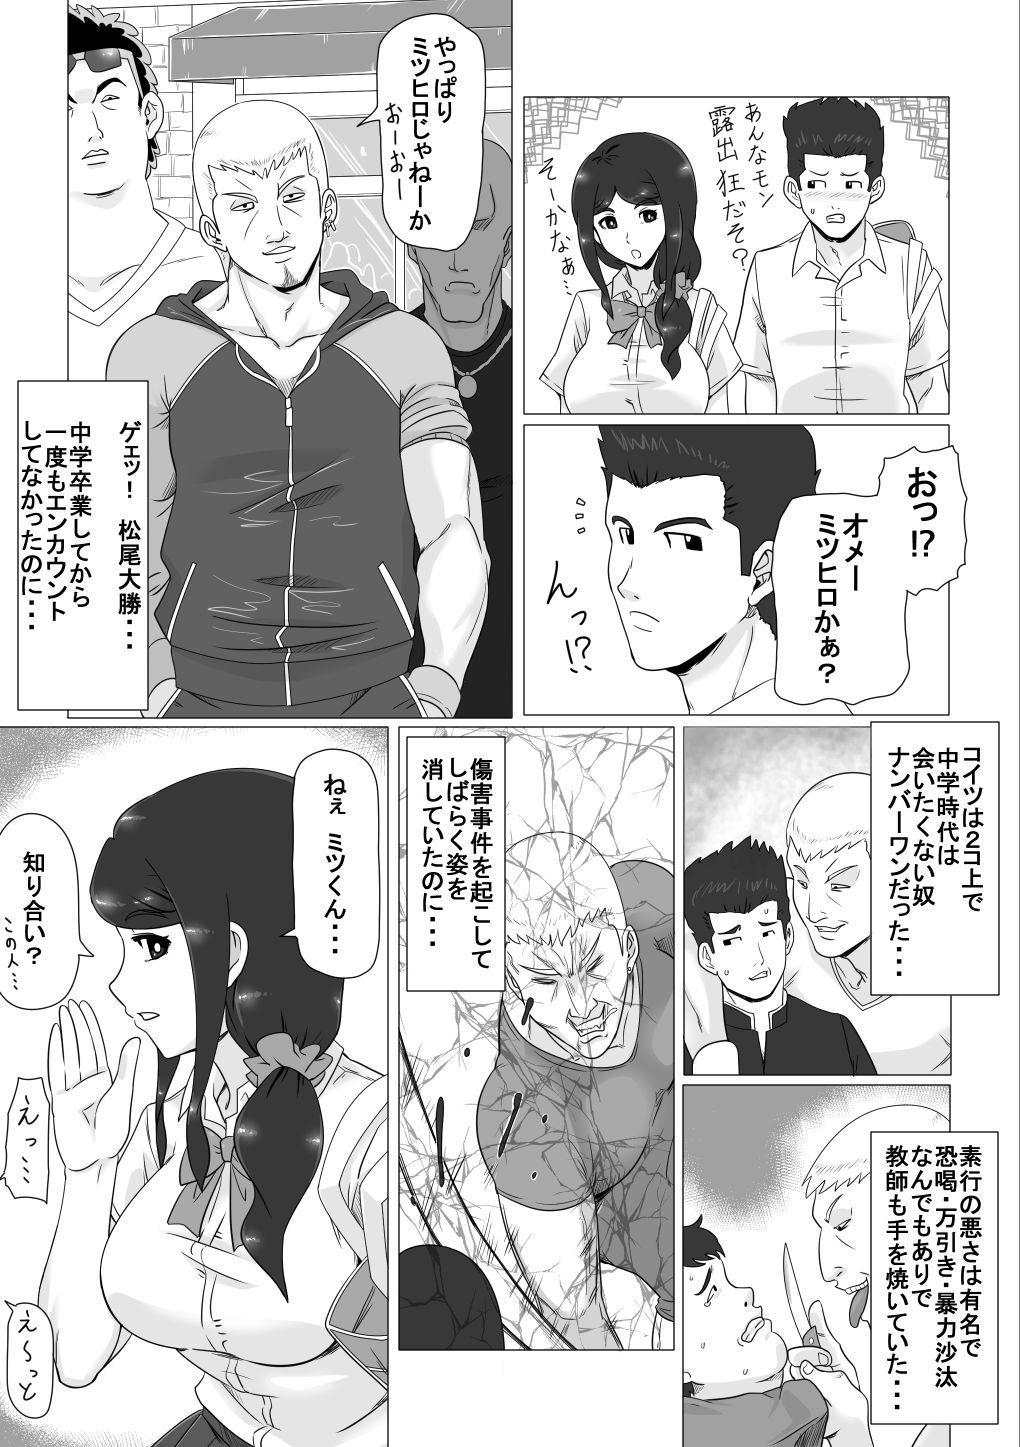 Osananajimi no Natsuyasumi 5